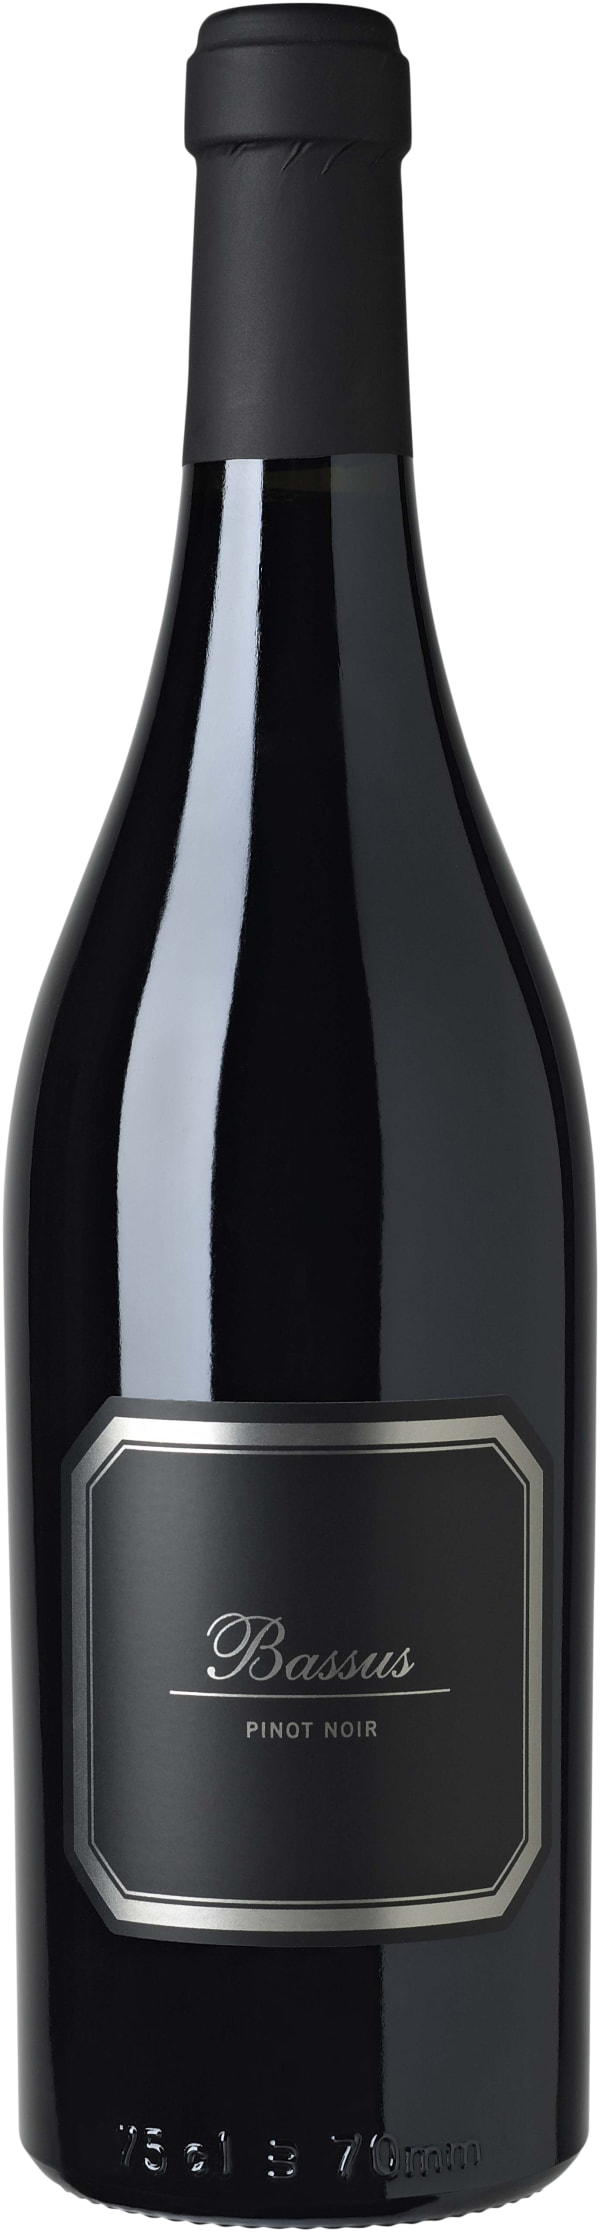 Hispano+Suizas Bassus Pinot Noir 2013